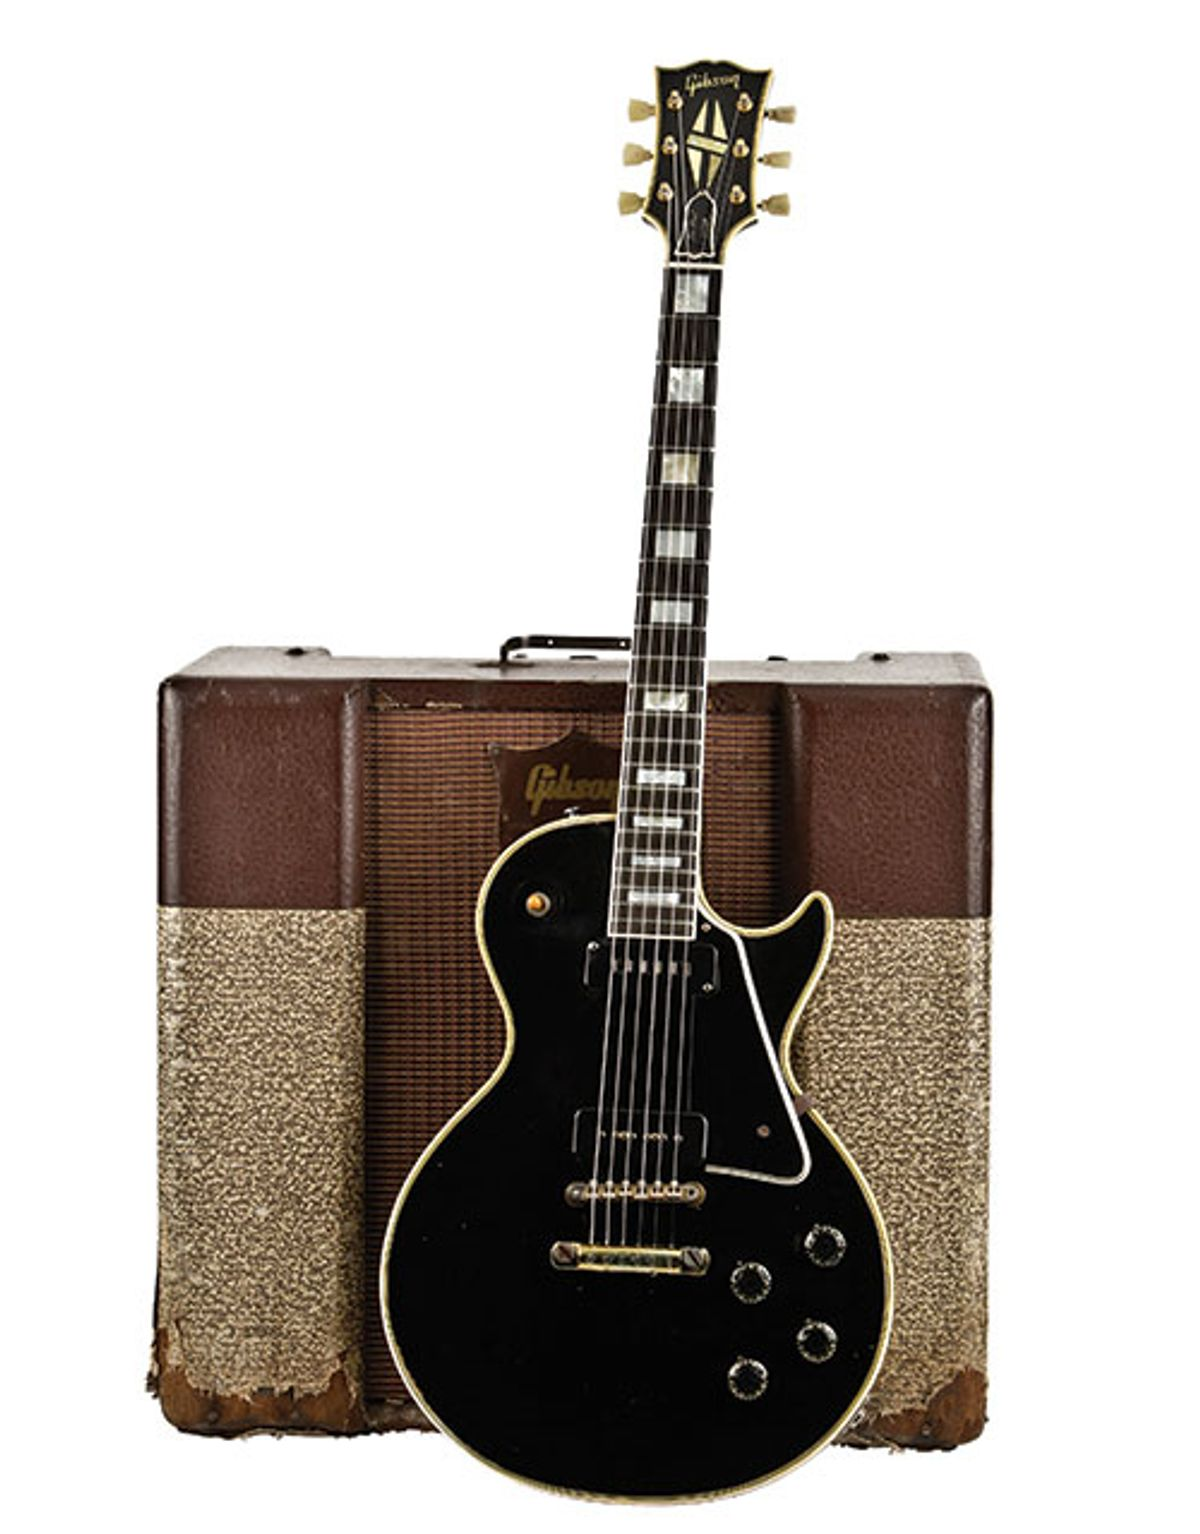 1955 Gibson Les Paul Custom and 1956 Gibson GA-70